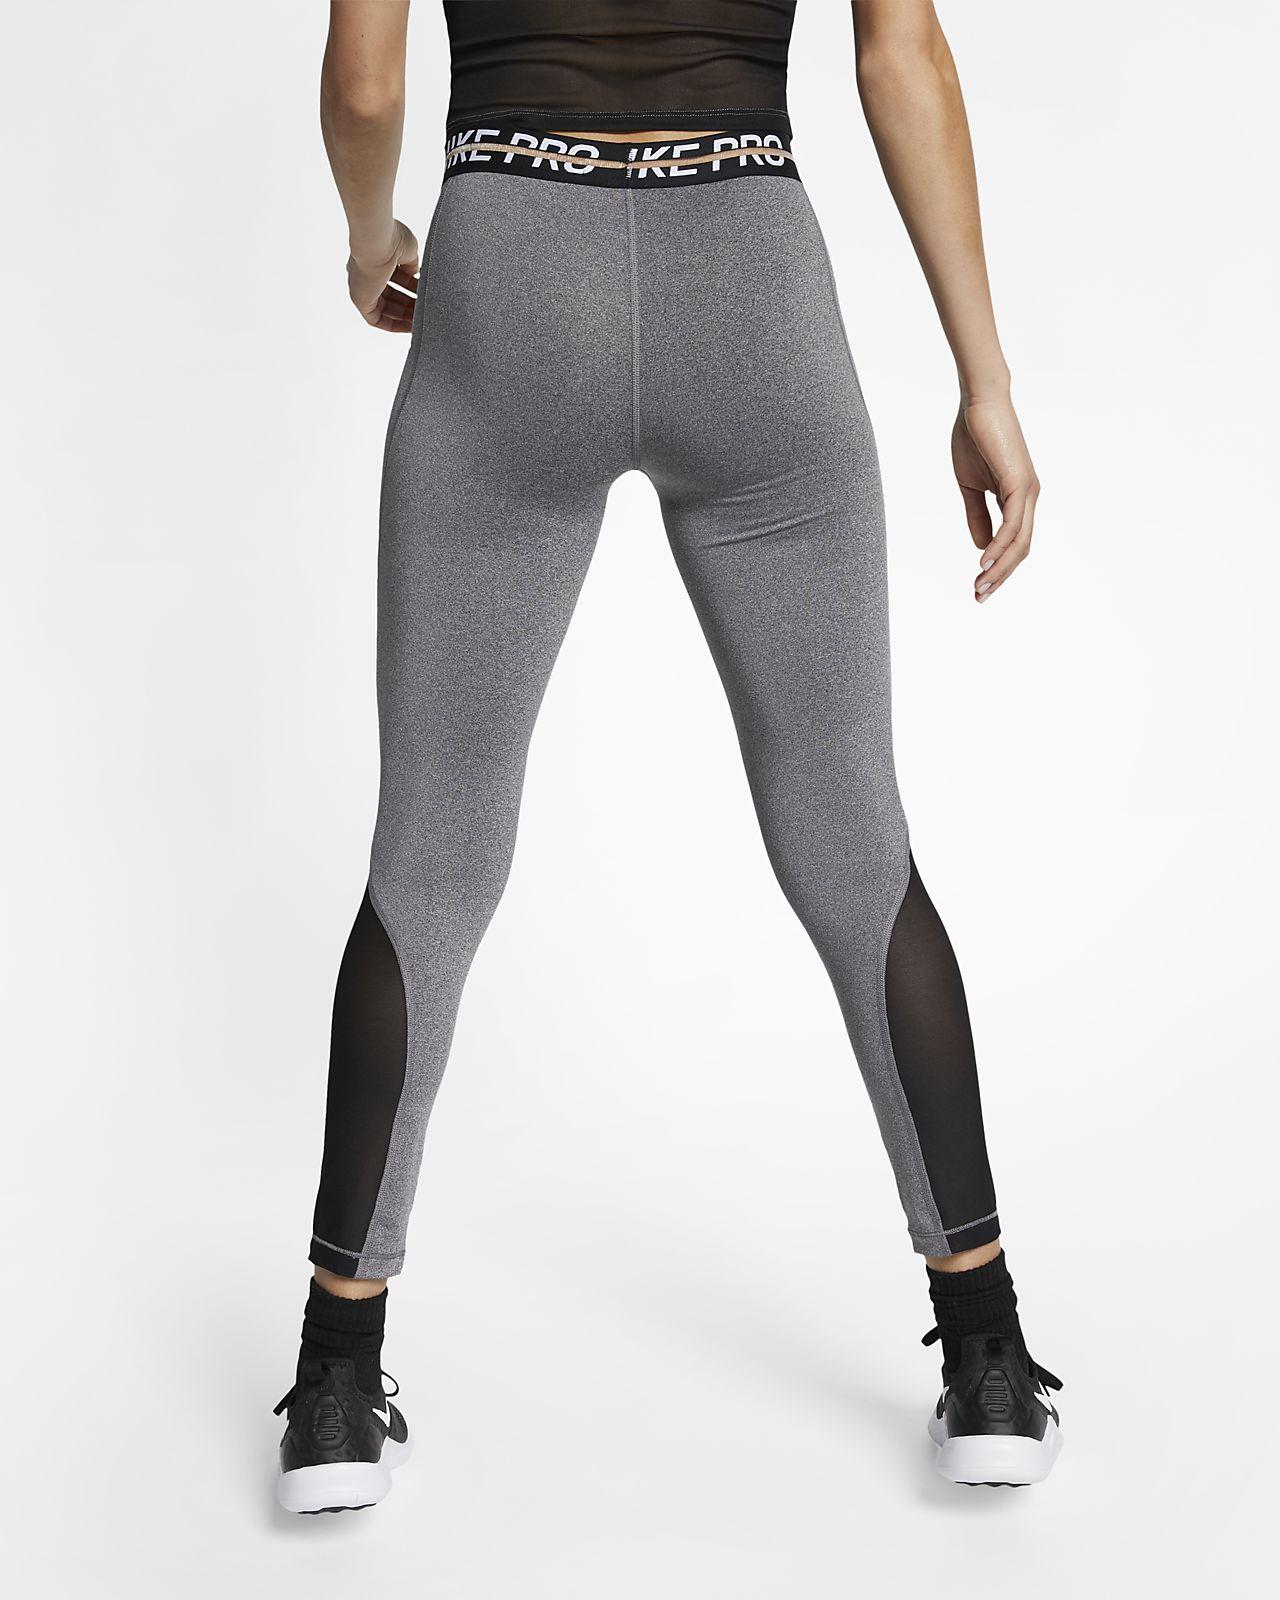 Neue Produkte Damen Nike Pro. AT